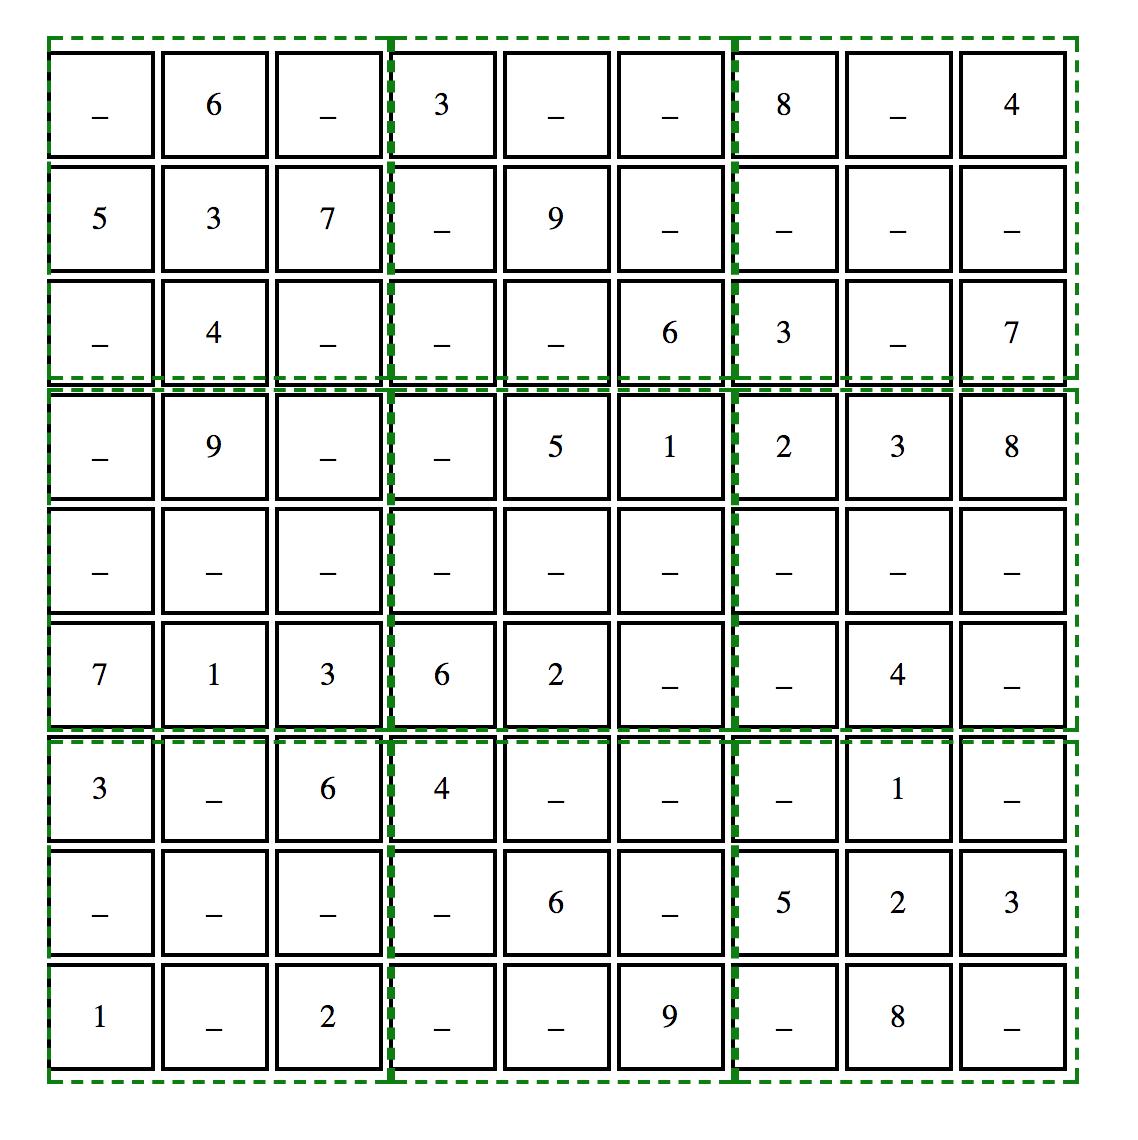 GitHub - joochanshin/sudokuSolver: Sudoku solver, and random